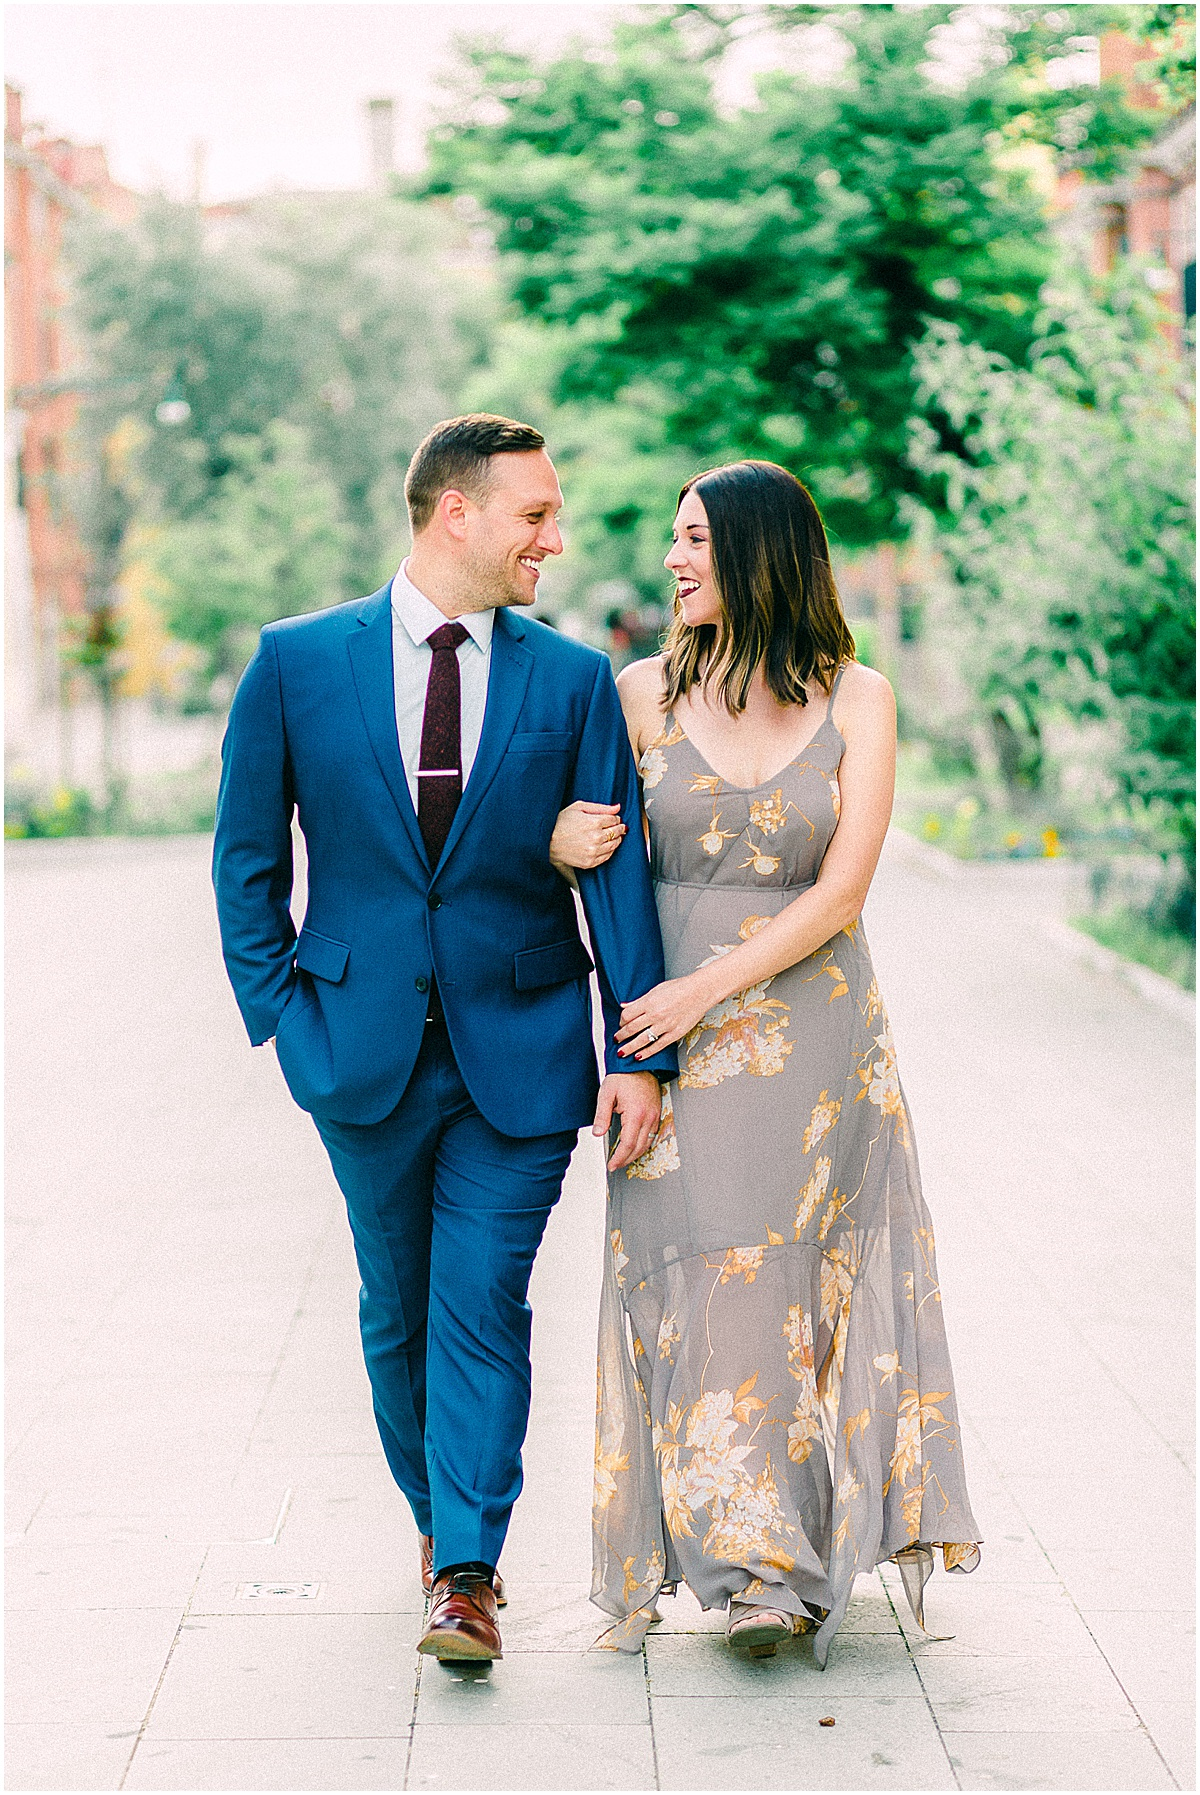 lifestyle-portrait-photography-couple-in-venice-gondola-sunrise-stefano-degirmenci_0206.jpg